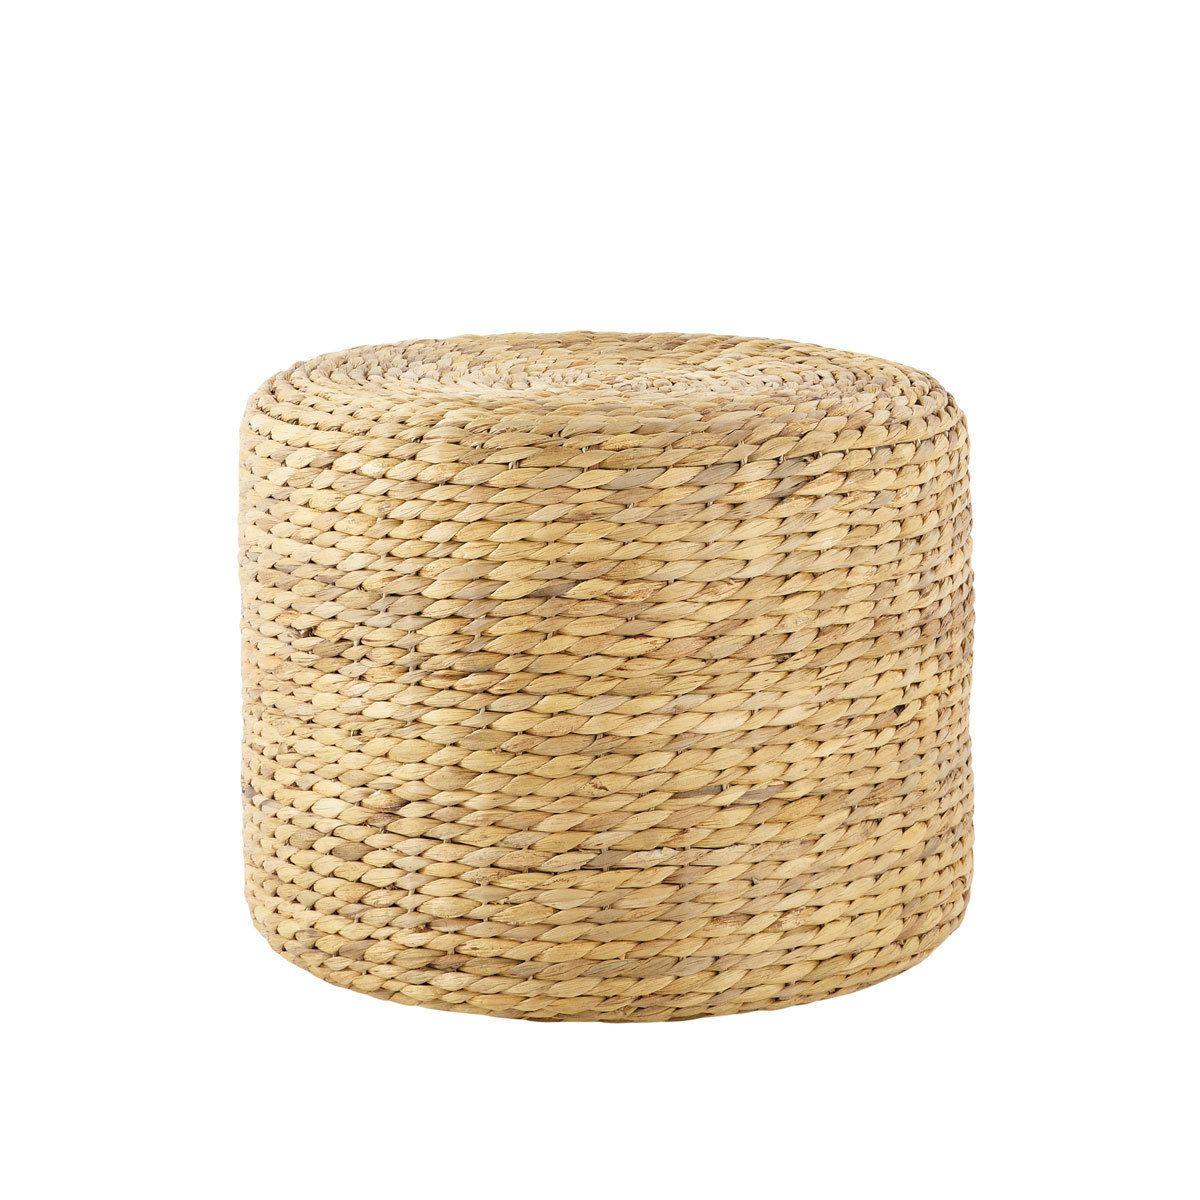 pouf en jonc de mer tress dining room pinterest jonc de mer pouf et tresser. Black Bedroom Furniture Sets. Home Design Ideas